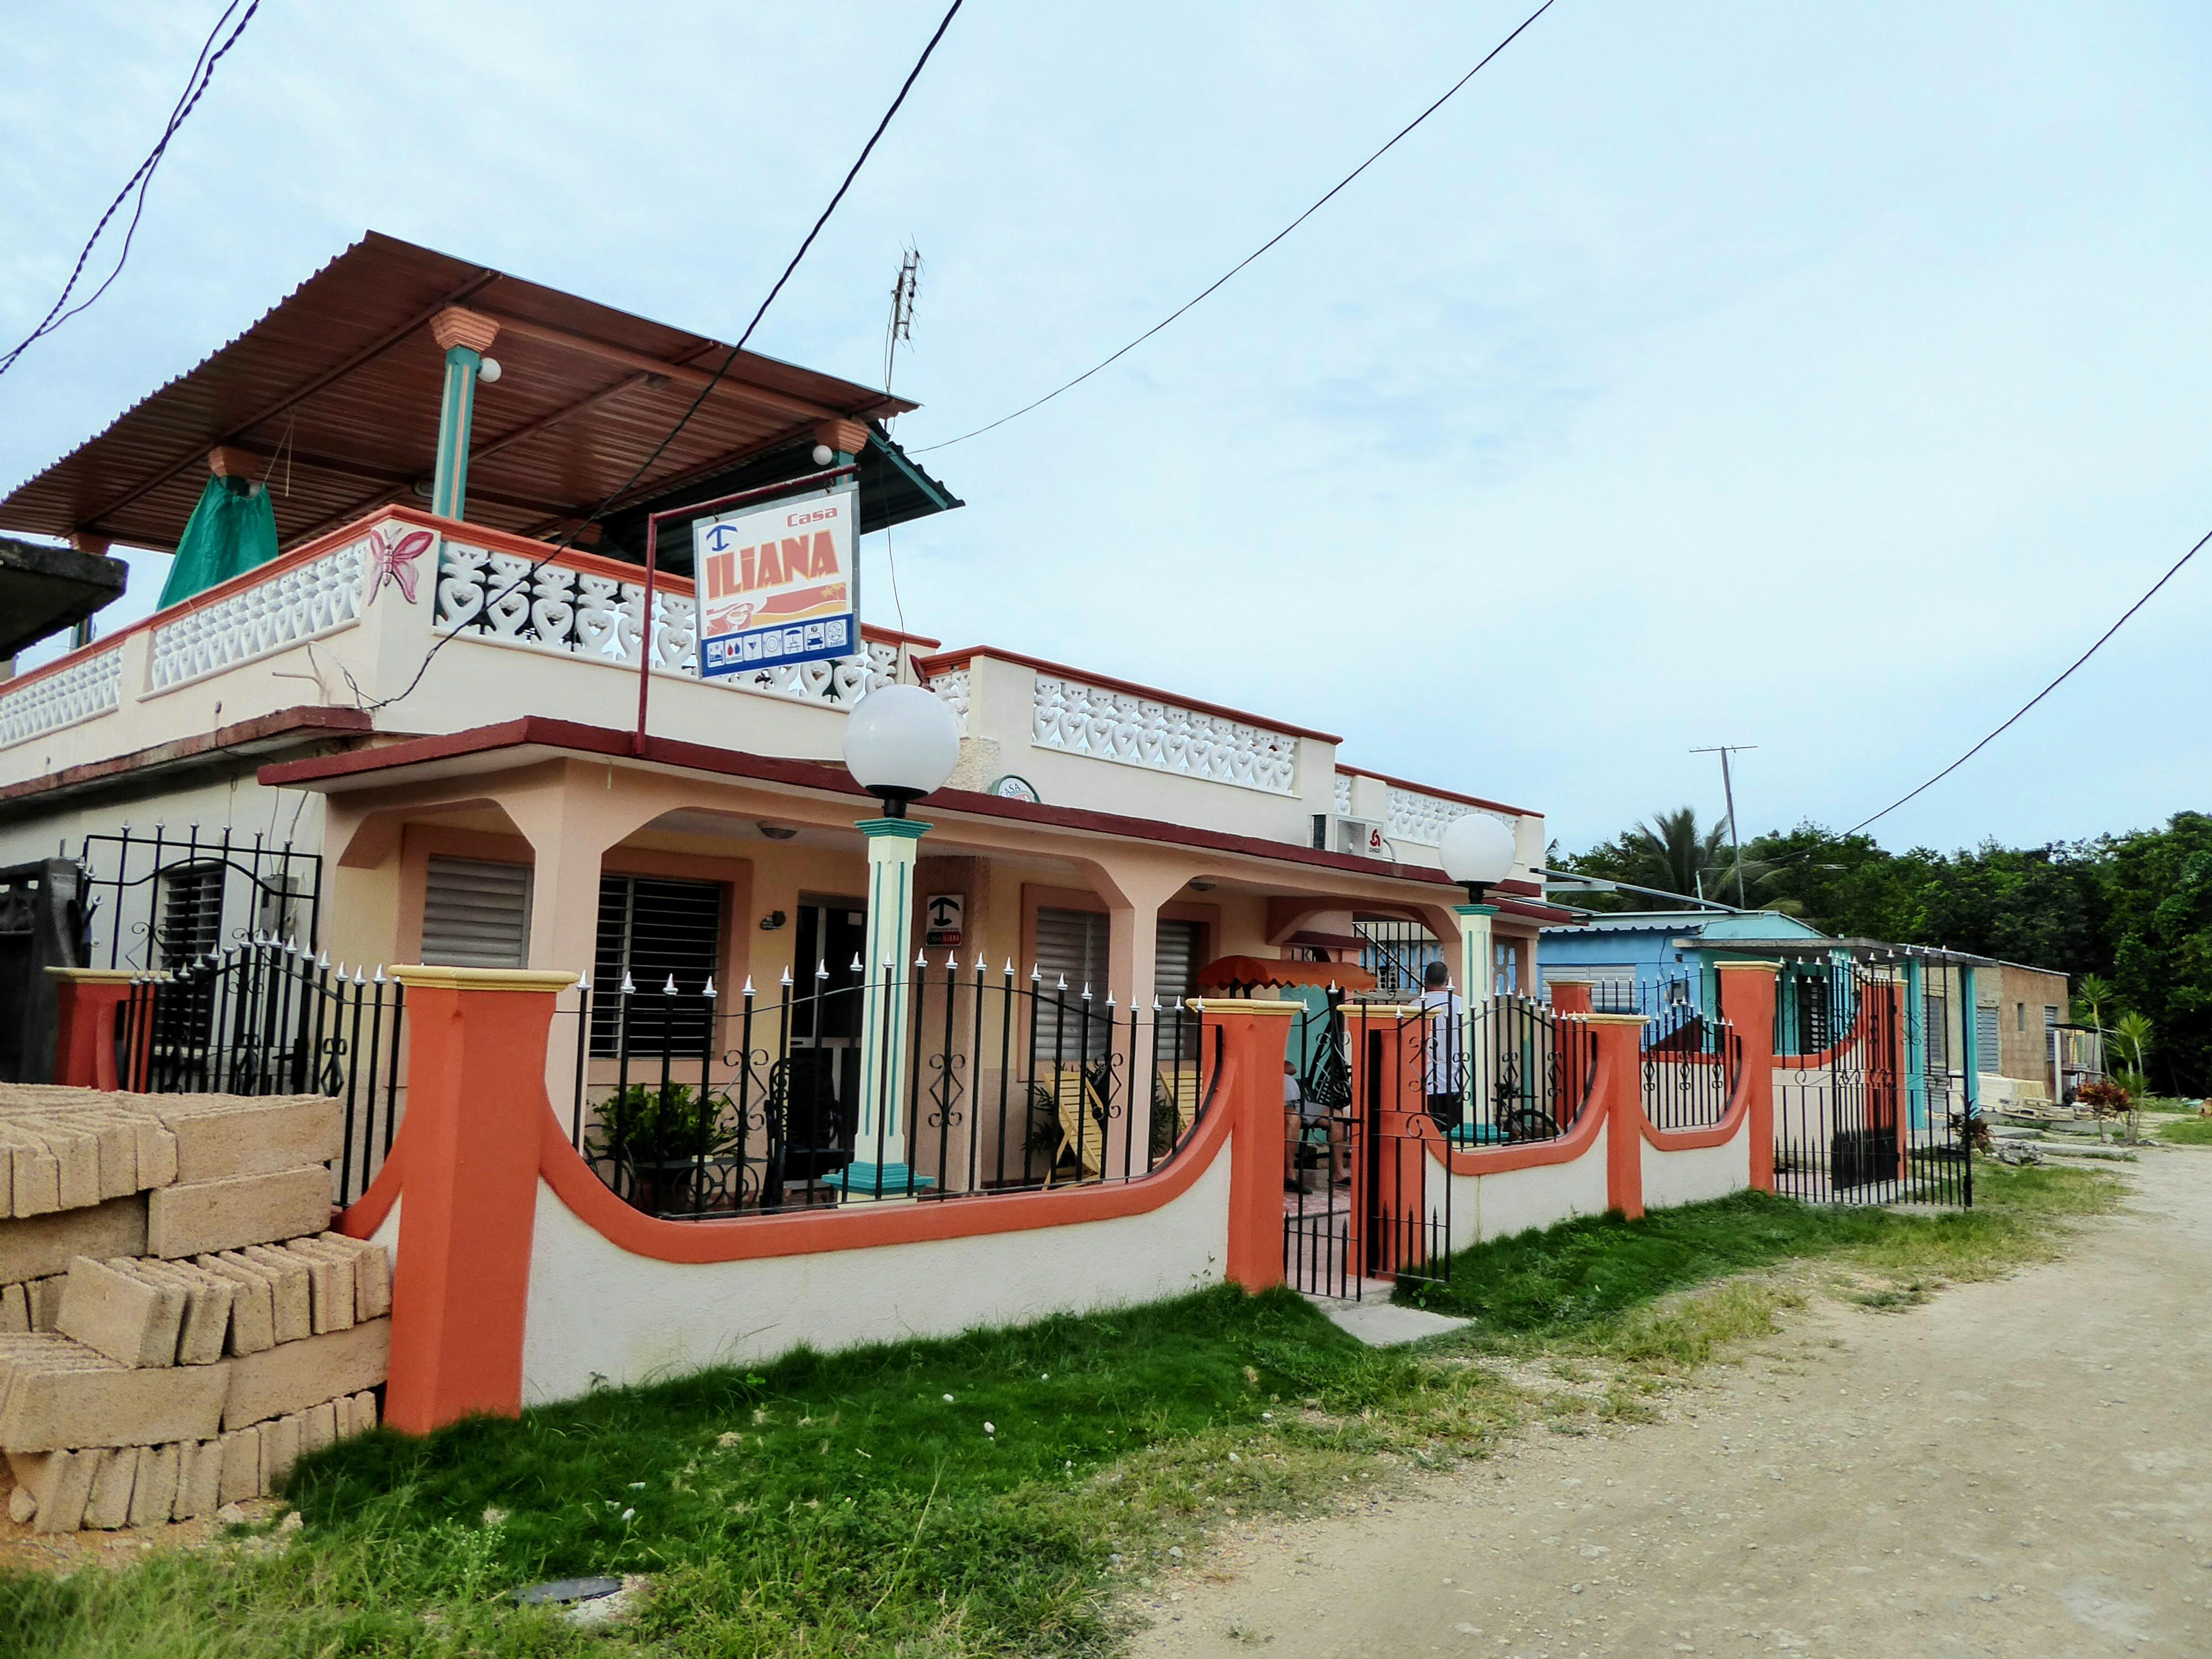 Casa's in Cuba